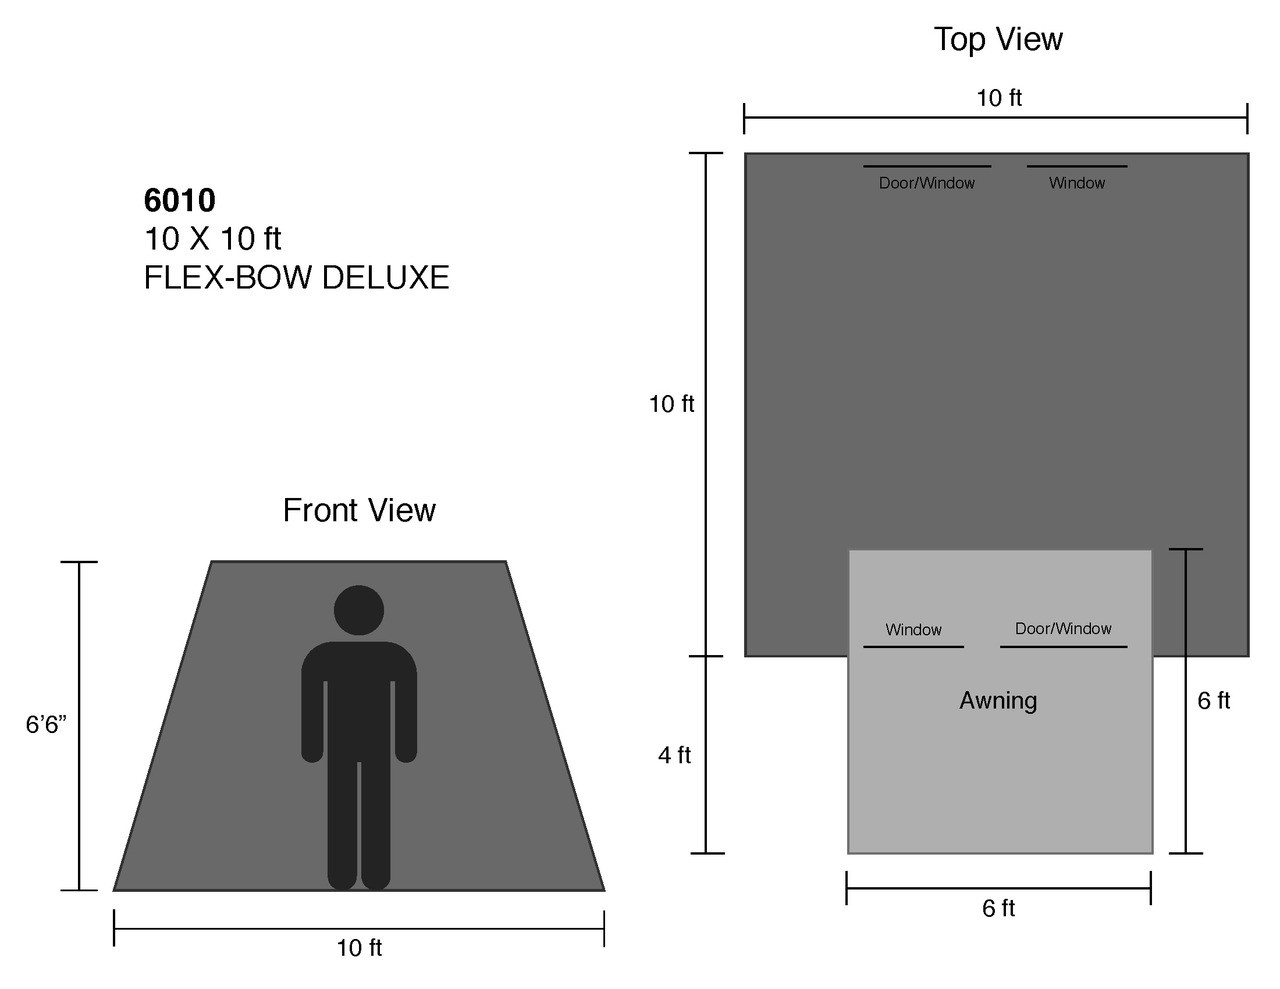 10 x 10 ft. Flex-Bow Canvas Tent - Deluxe